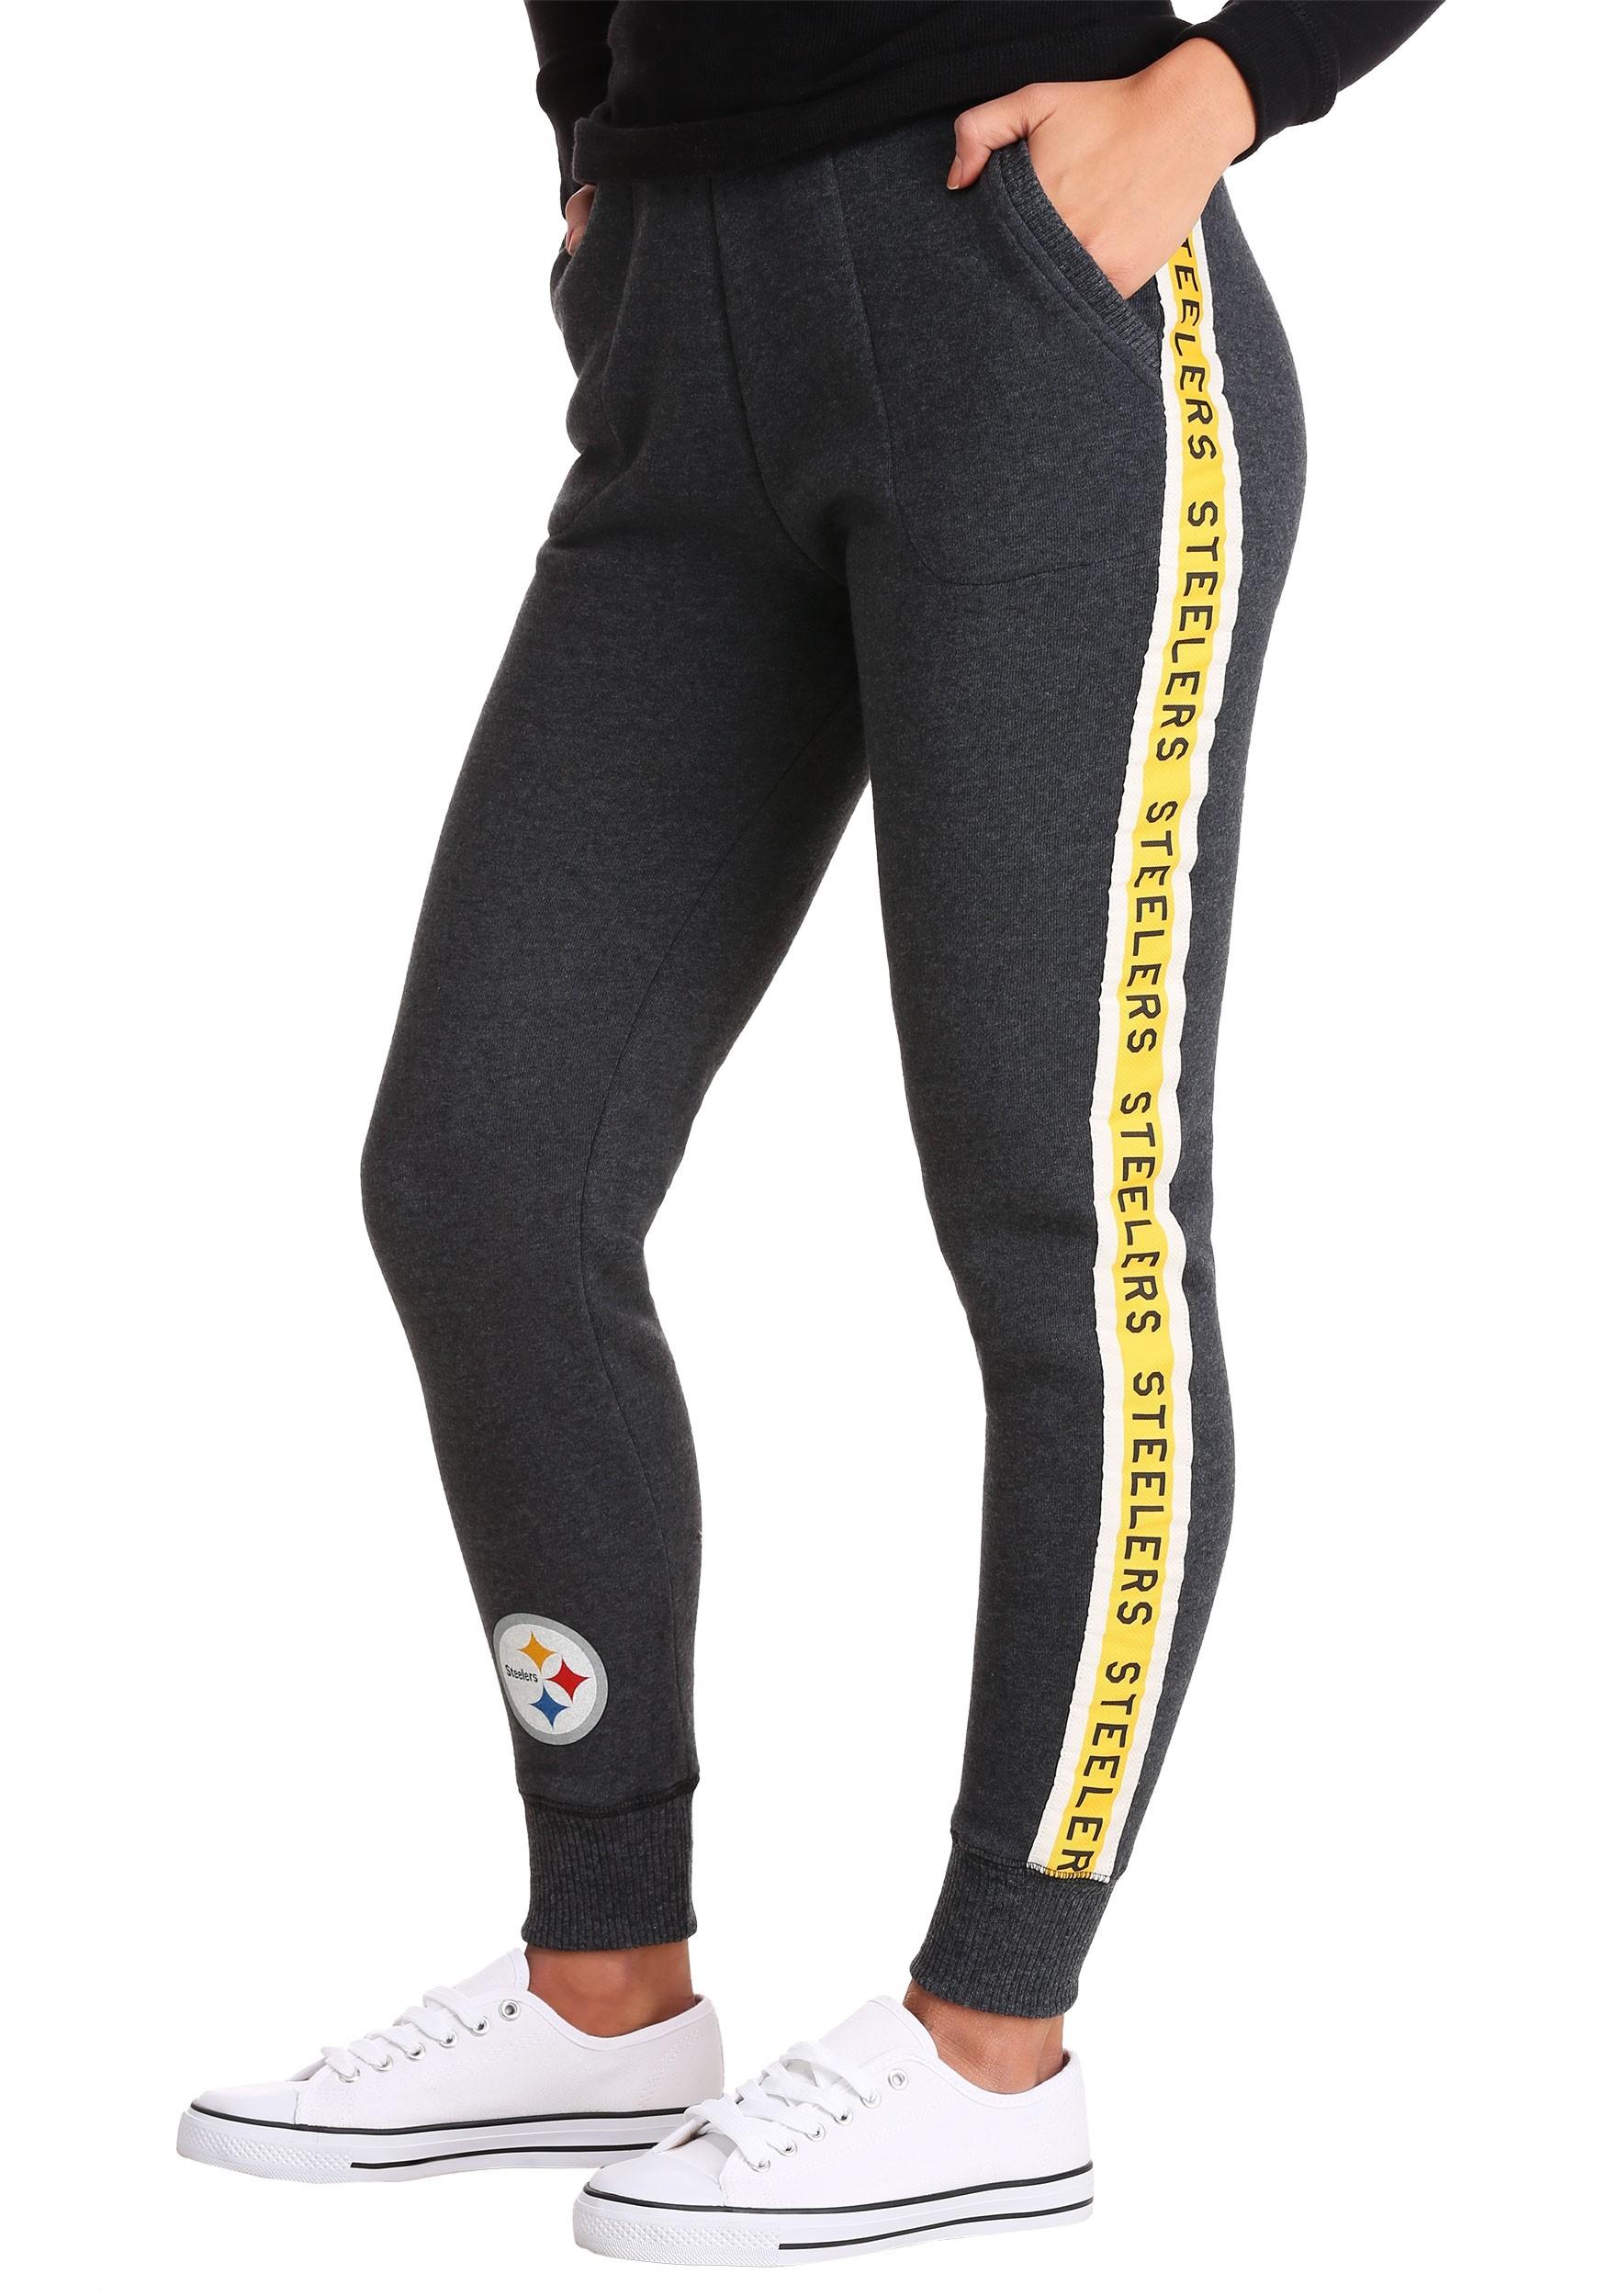 a77346275 Women s Pittsburgh Steelers Fleece Joggers update1